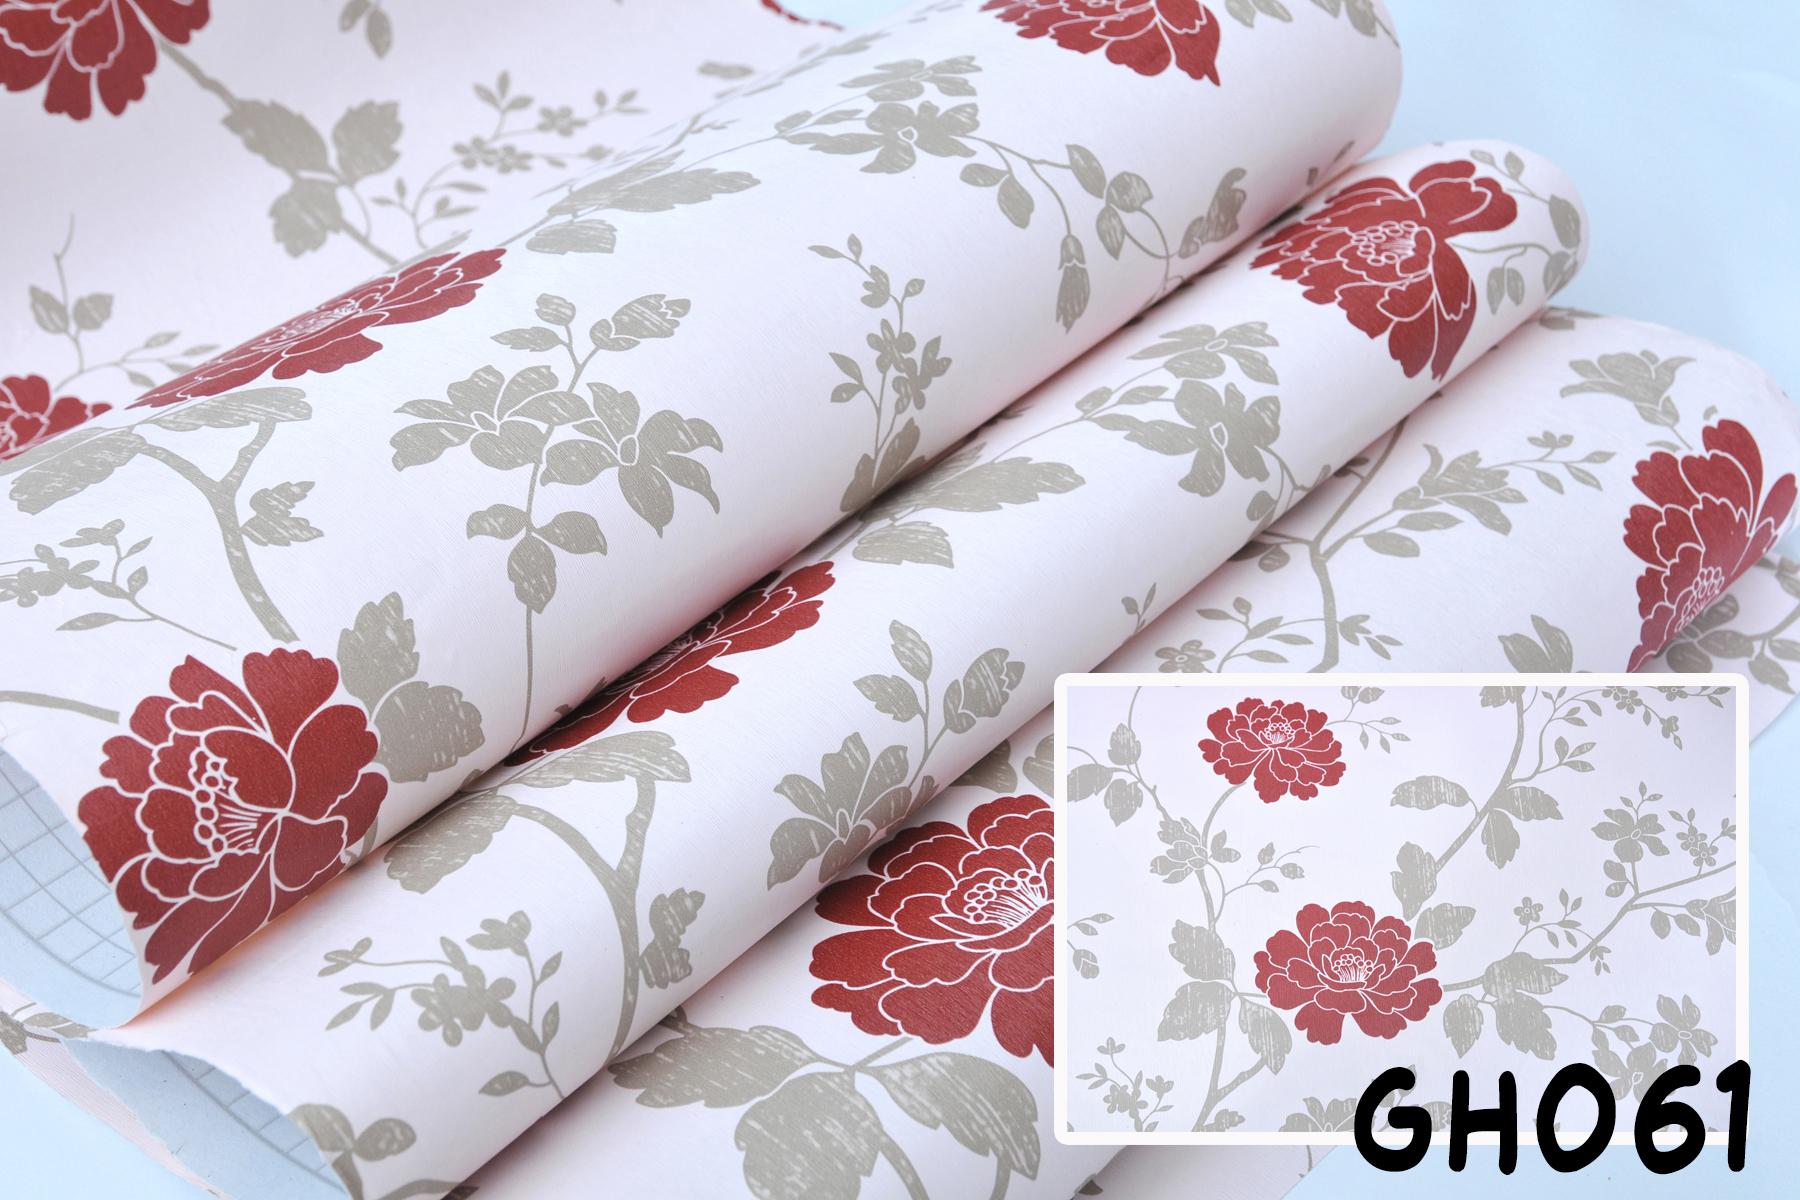 Wallpaper Stiker Dinding Motif Dan Karakter Premium Quality Size 45cm X 10M Bunga Mawar Merah GH061